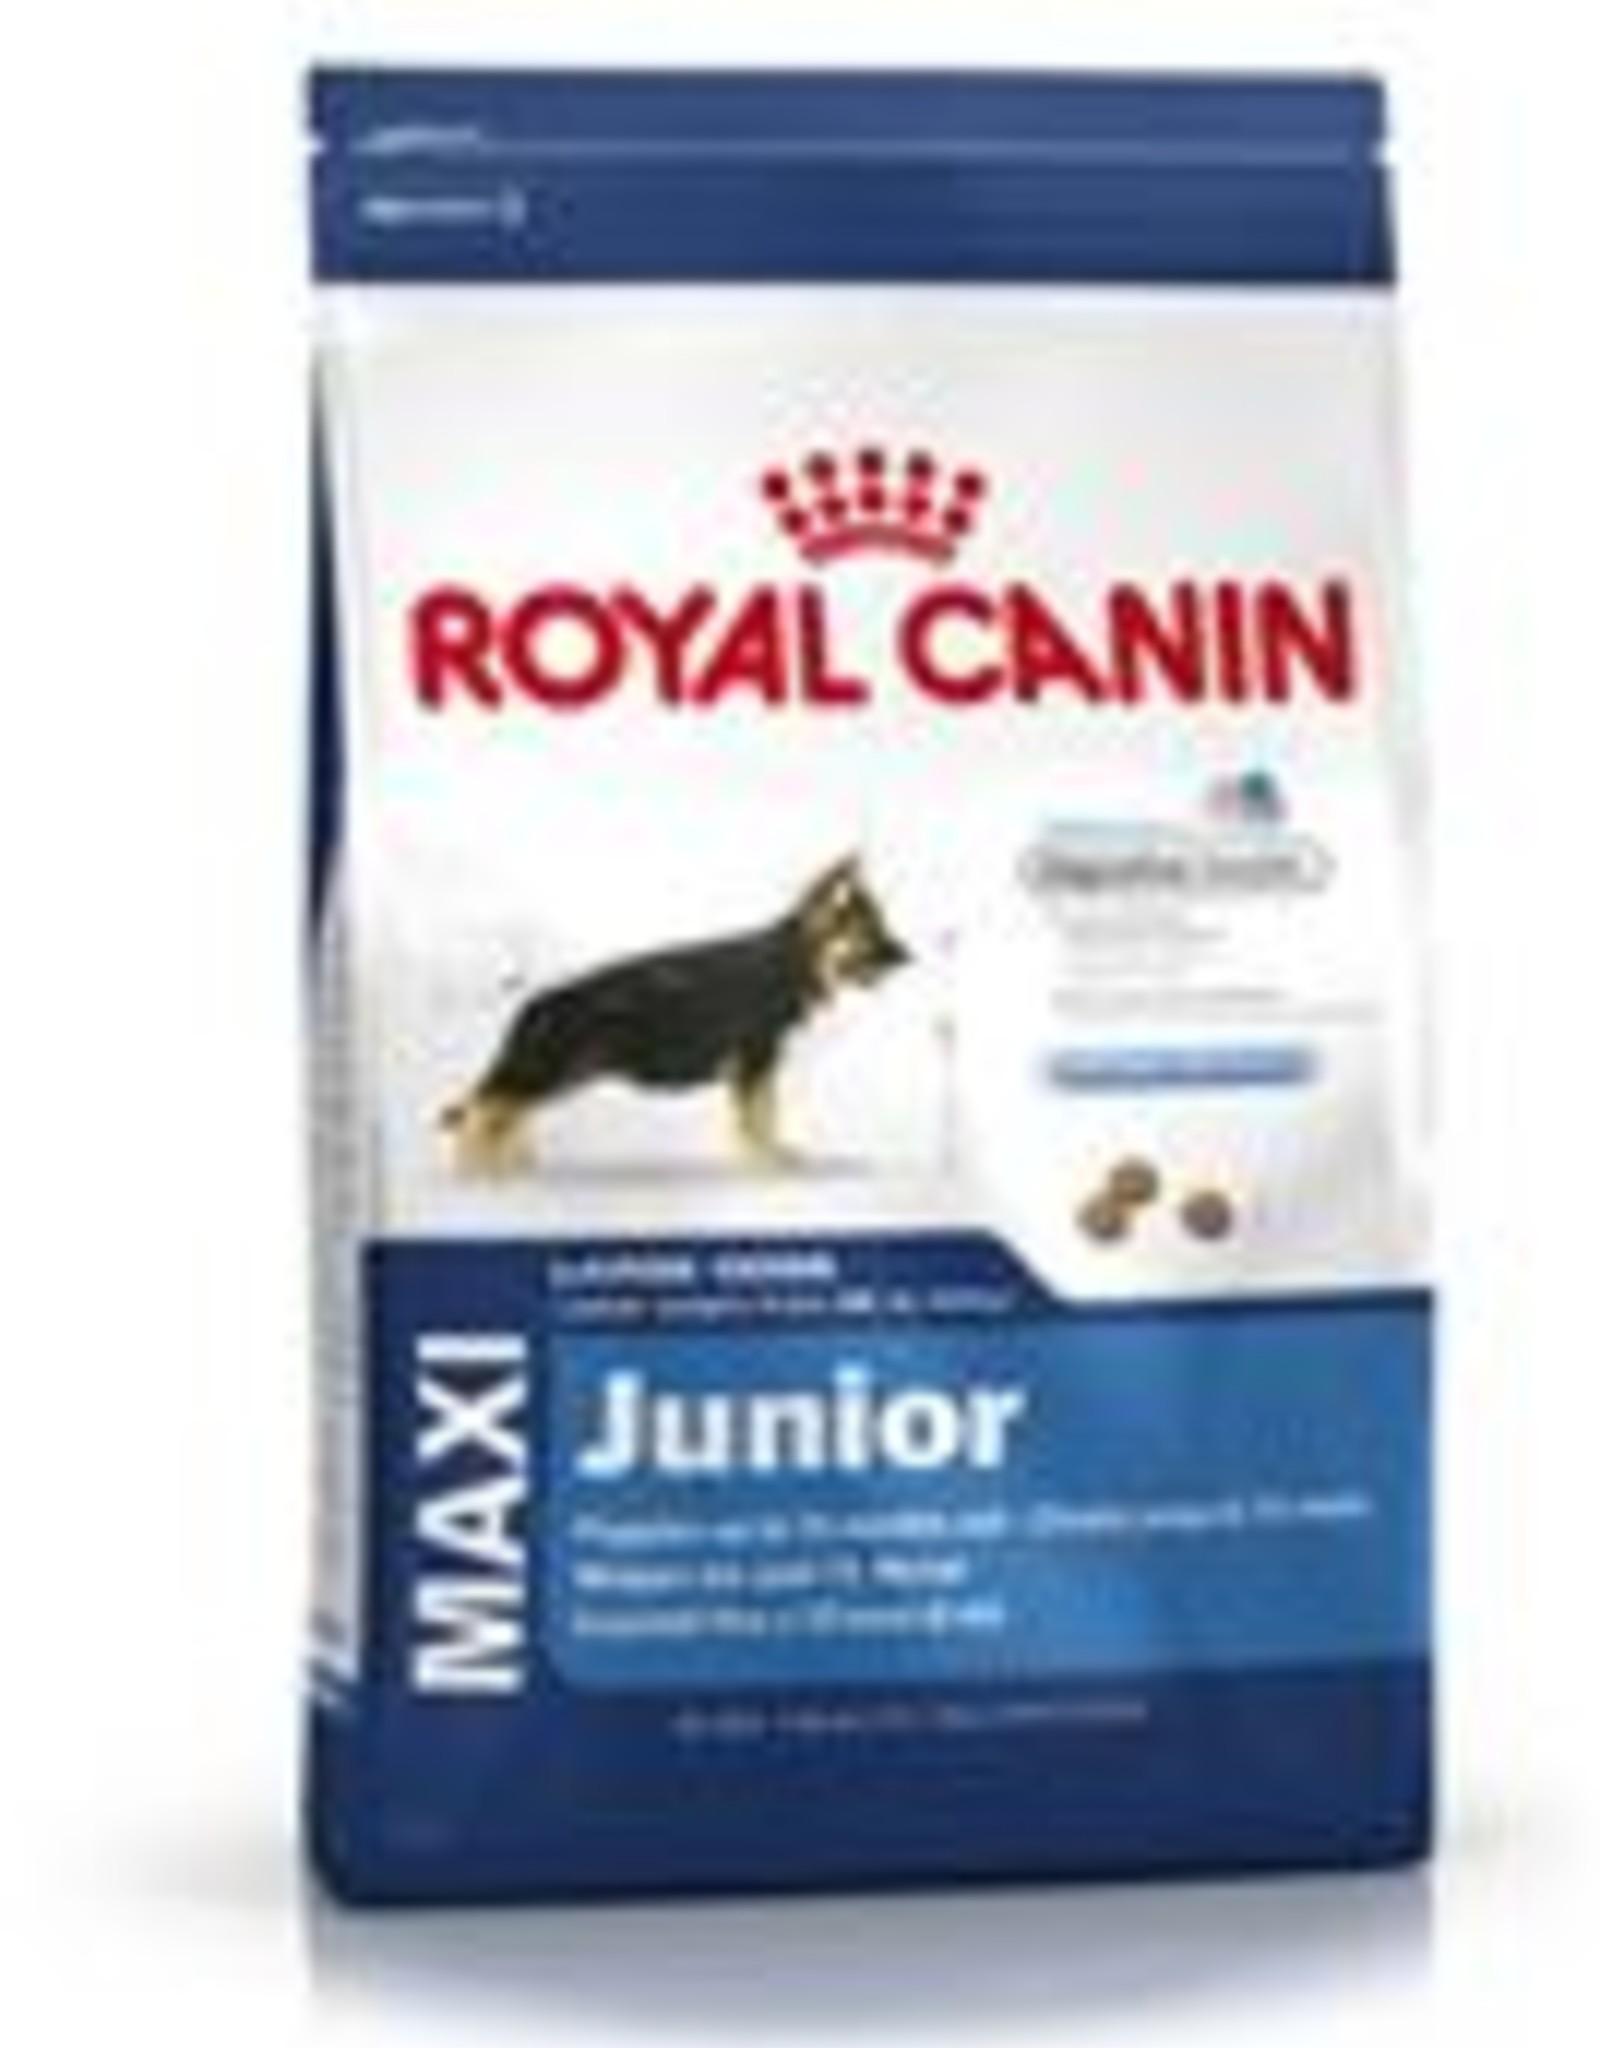 Royal Canin Royal Canin Shn Maxi Junior Rind Hund 10kg